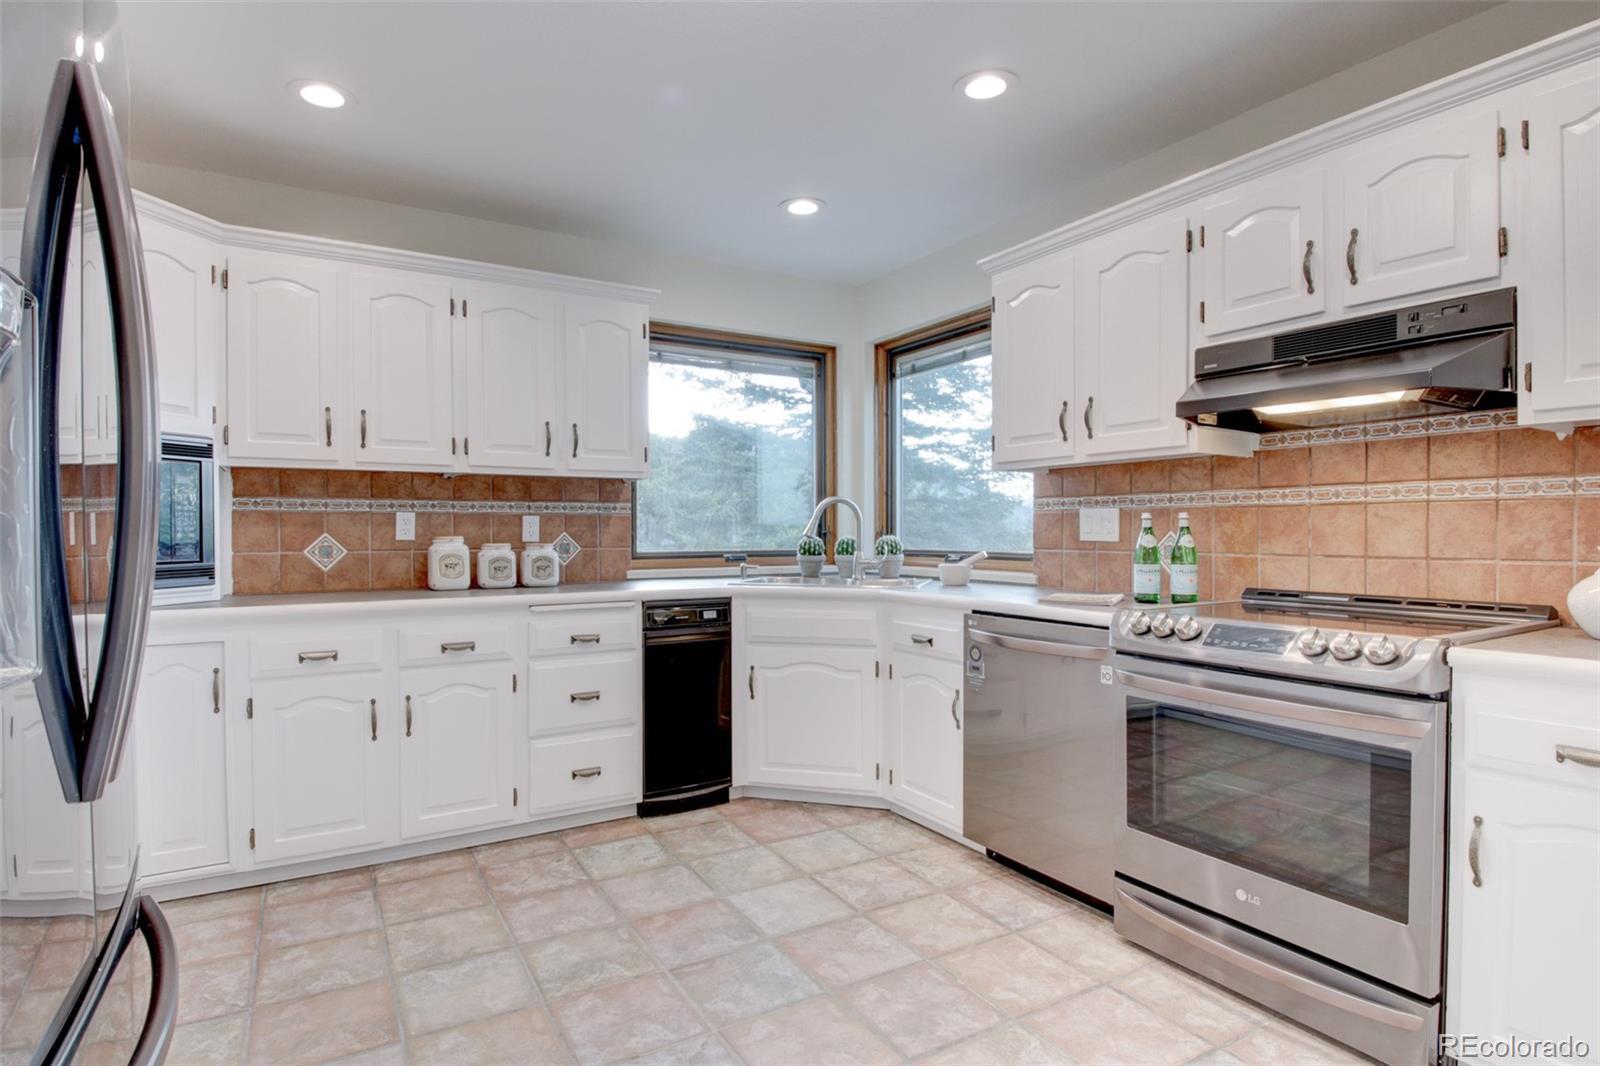 MLS# 1691148 - 8 - 384 Deer Trail Road, Boulder, CO 80302